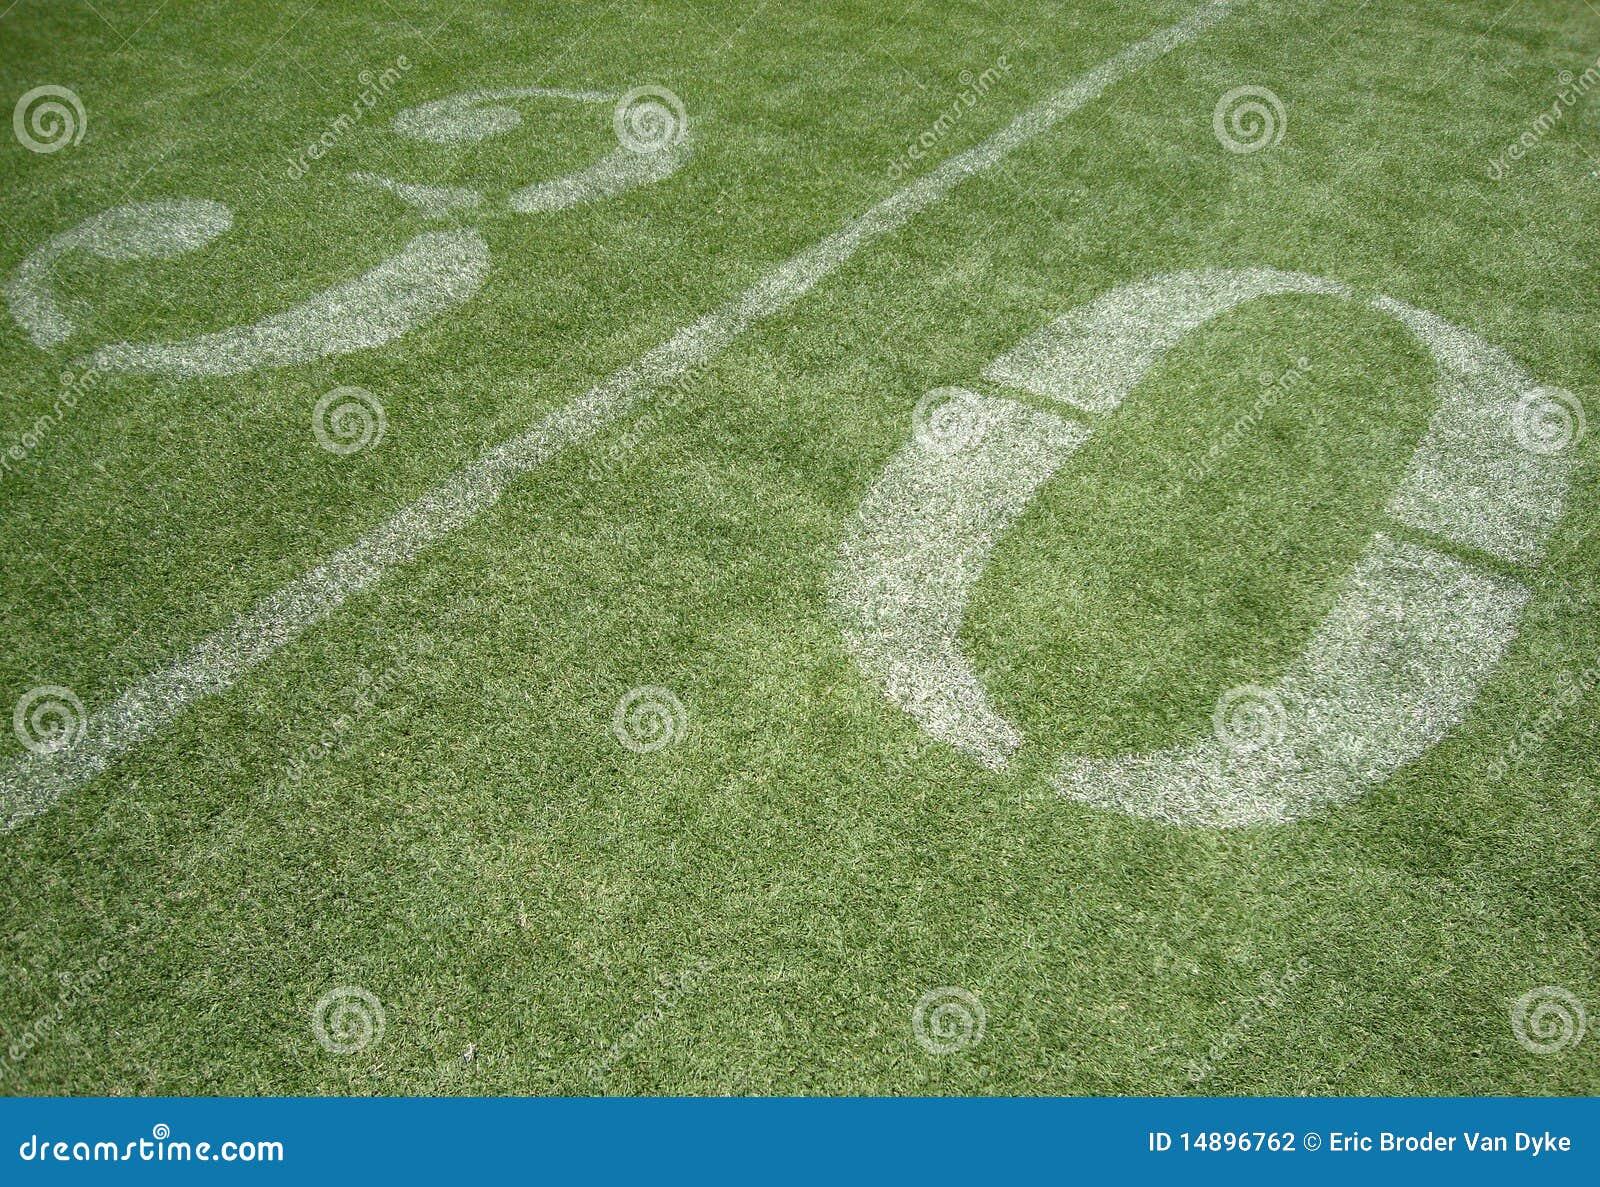 Línea de yardas 30